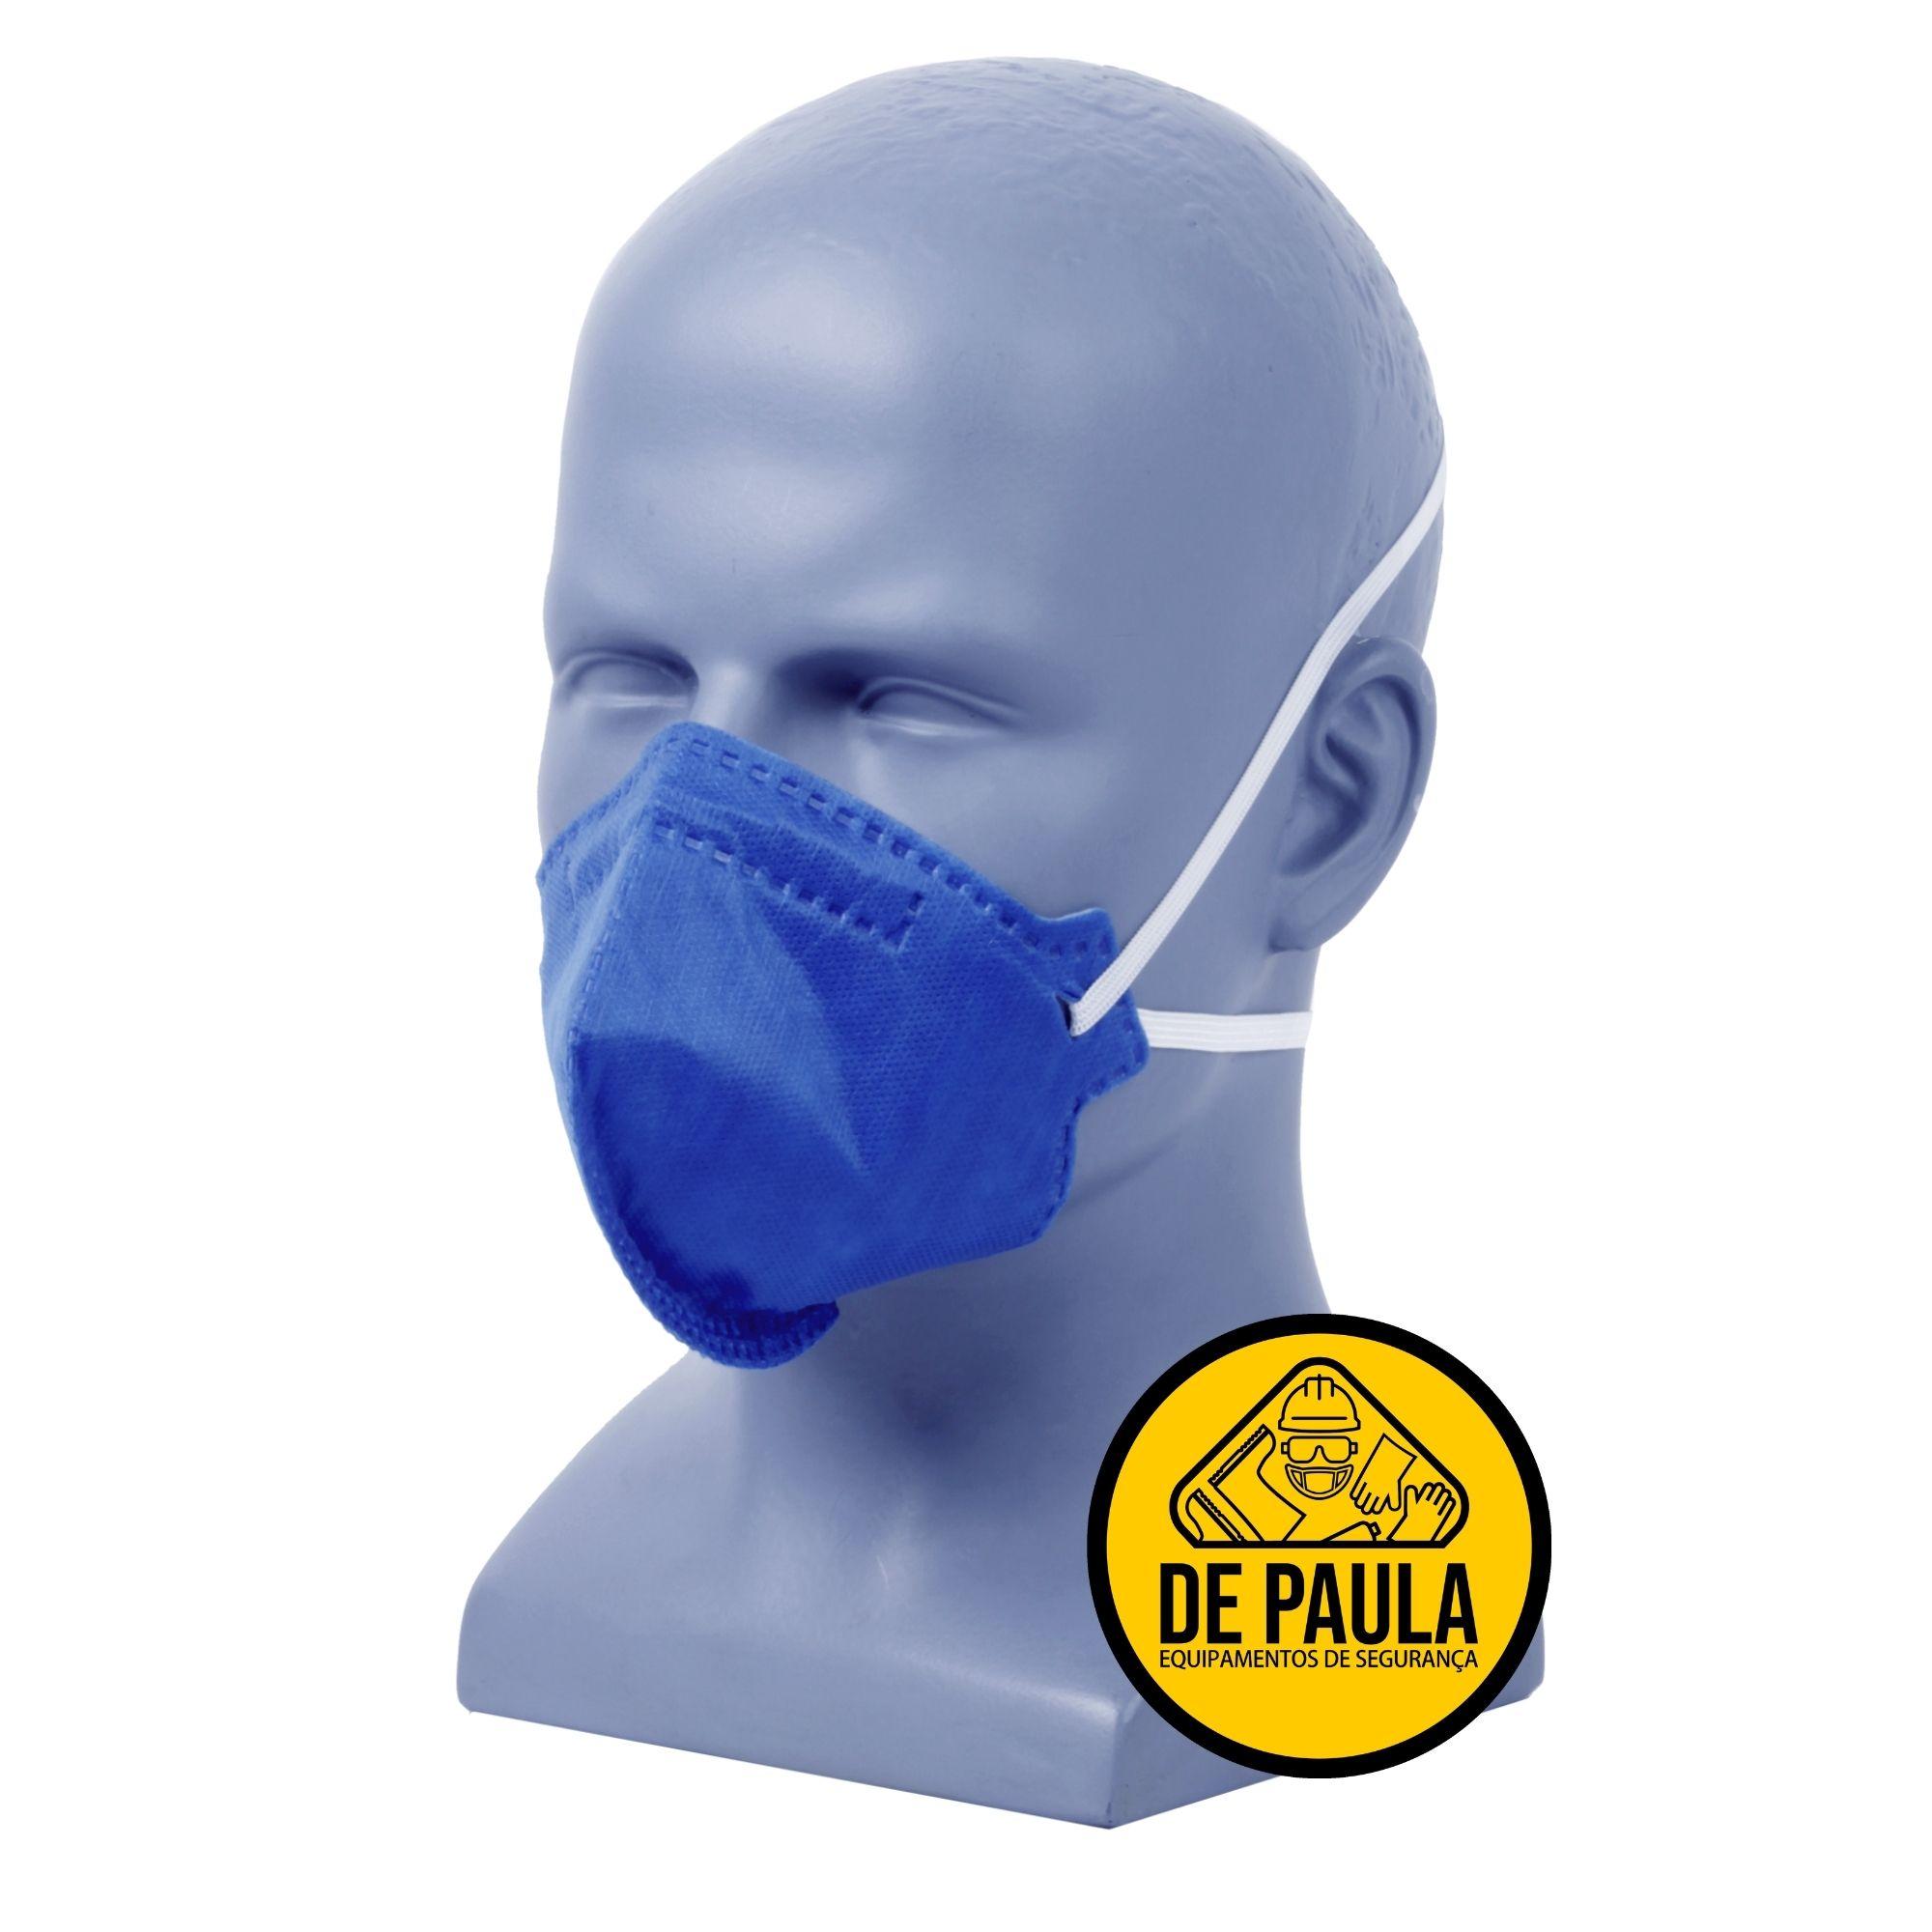 Kit de 100 unidades de Mascara Descartável Pff2 Pro Agro sem válvula - Delta Plus  - DE PAULA EPI